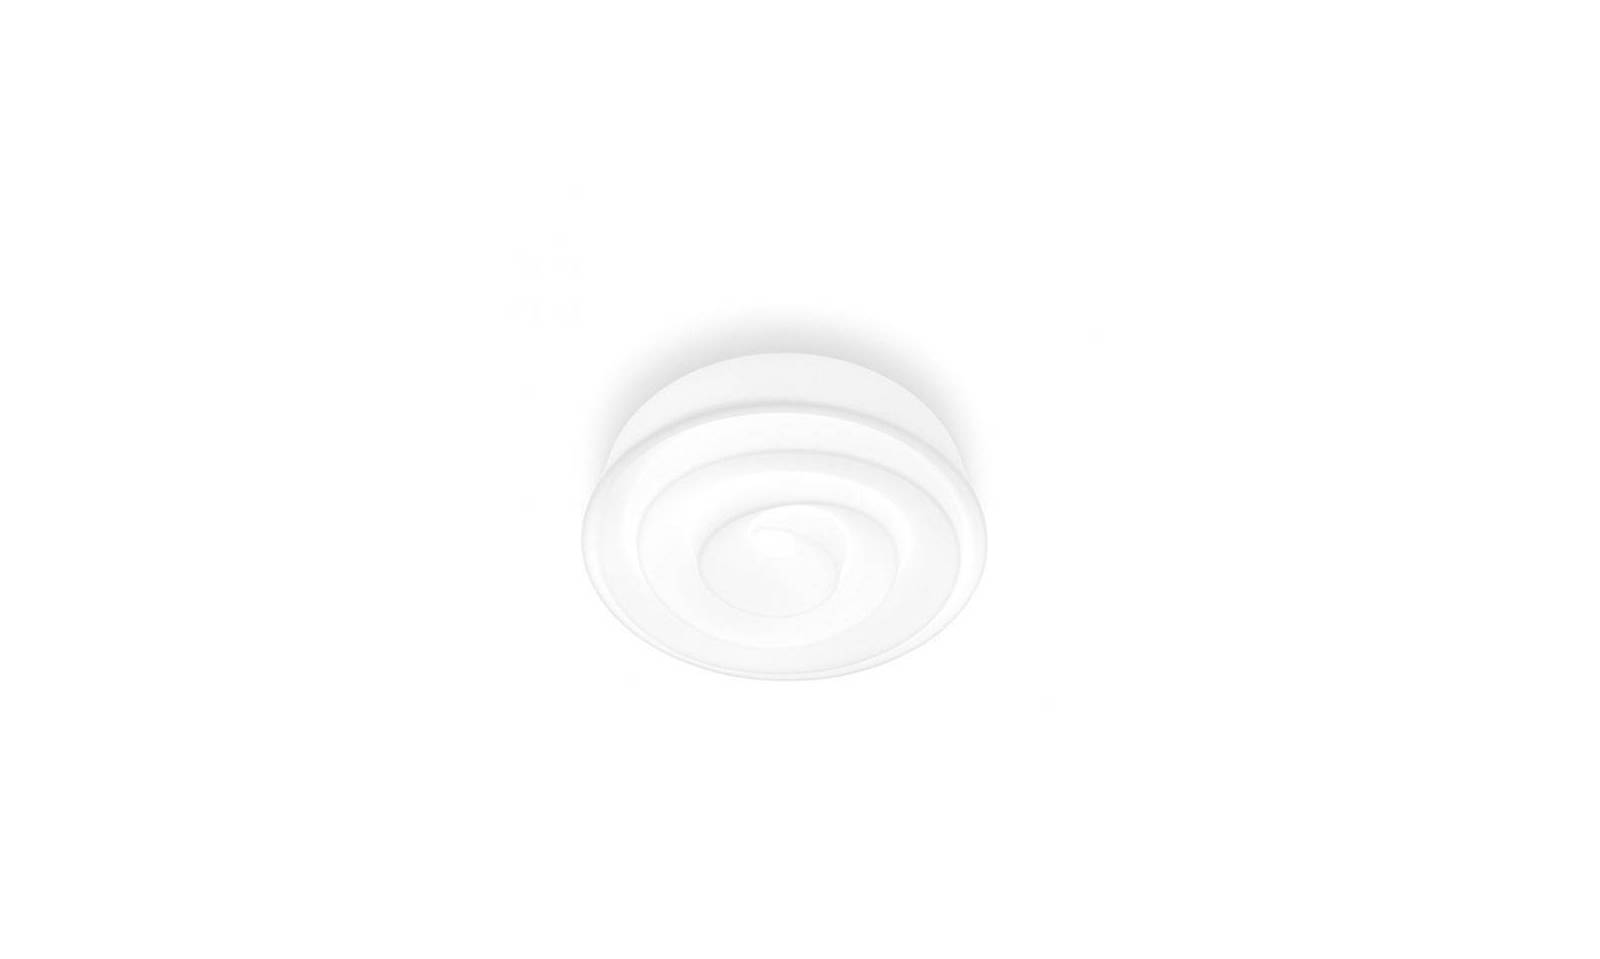 Plafoniere Con Rose : Linea light plafoniera moderna in metallo serie rose